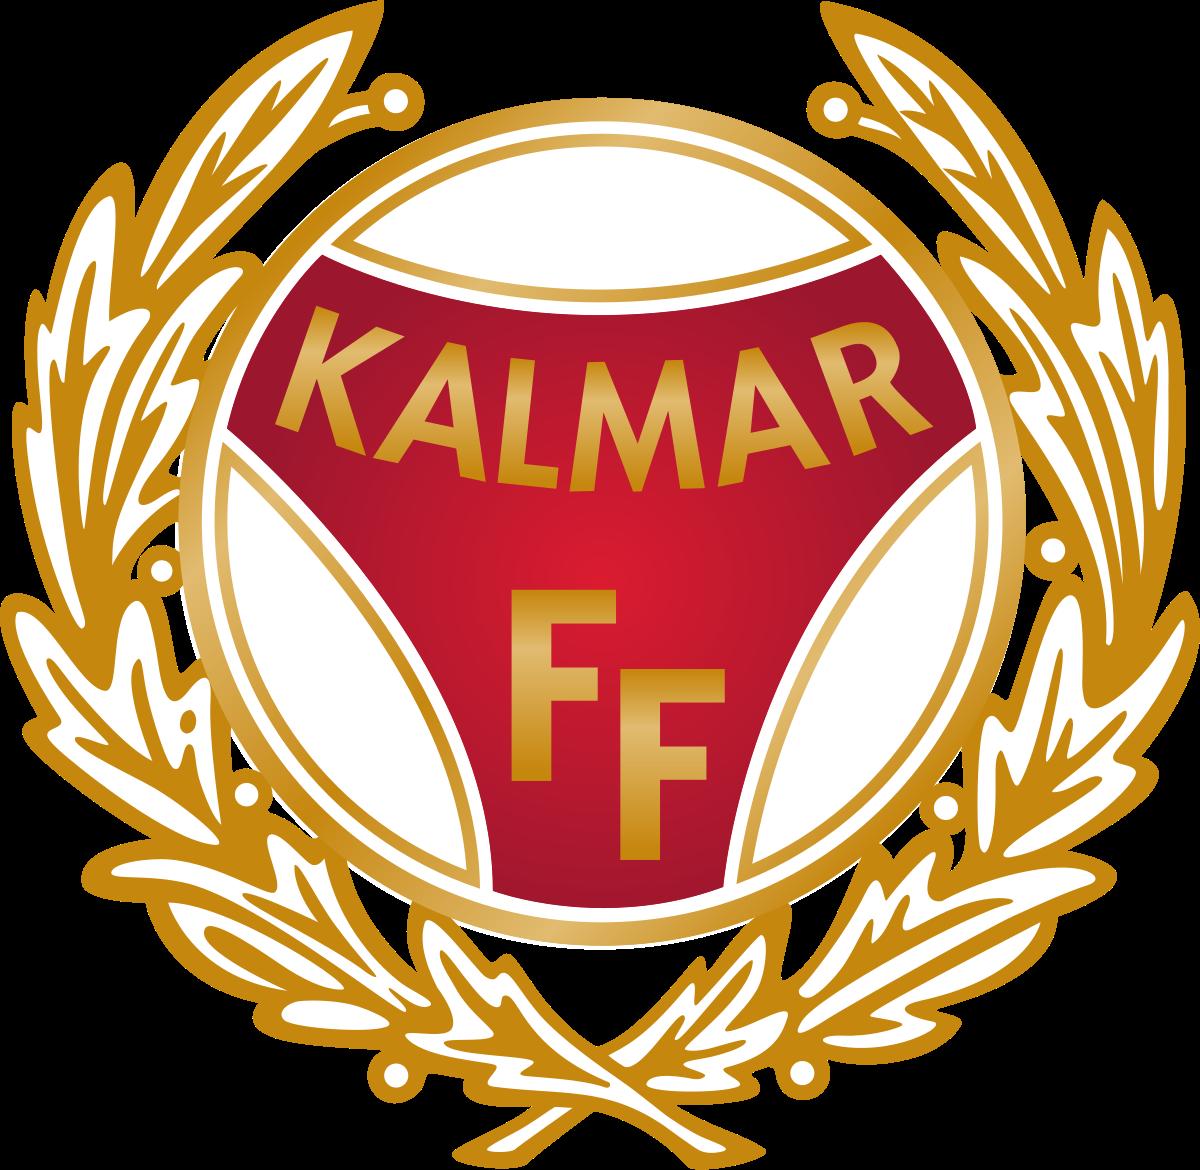 Kalmar U-21 logo